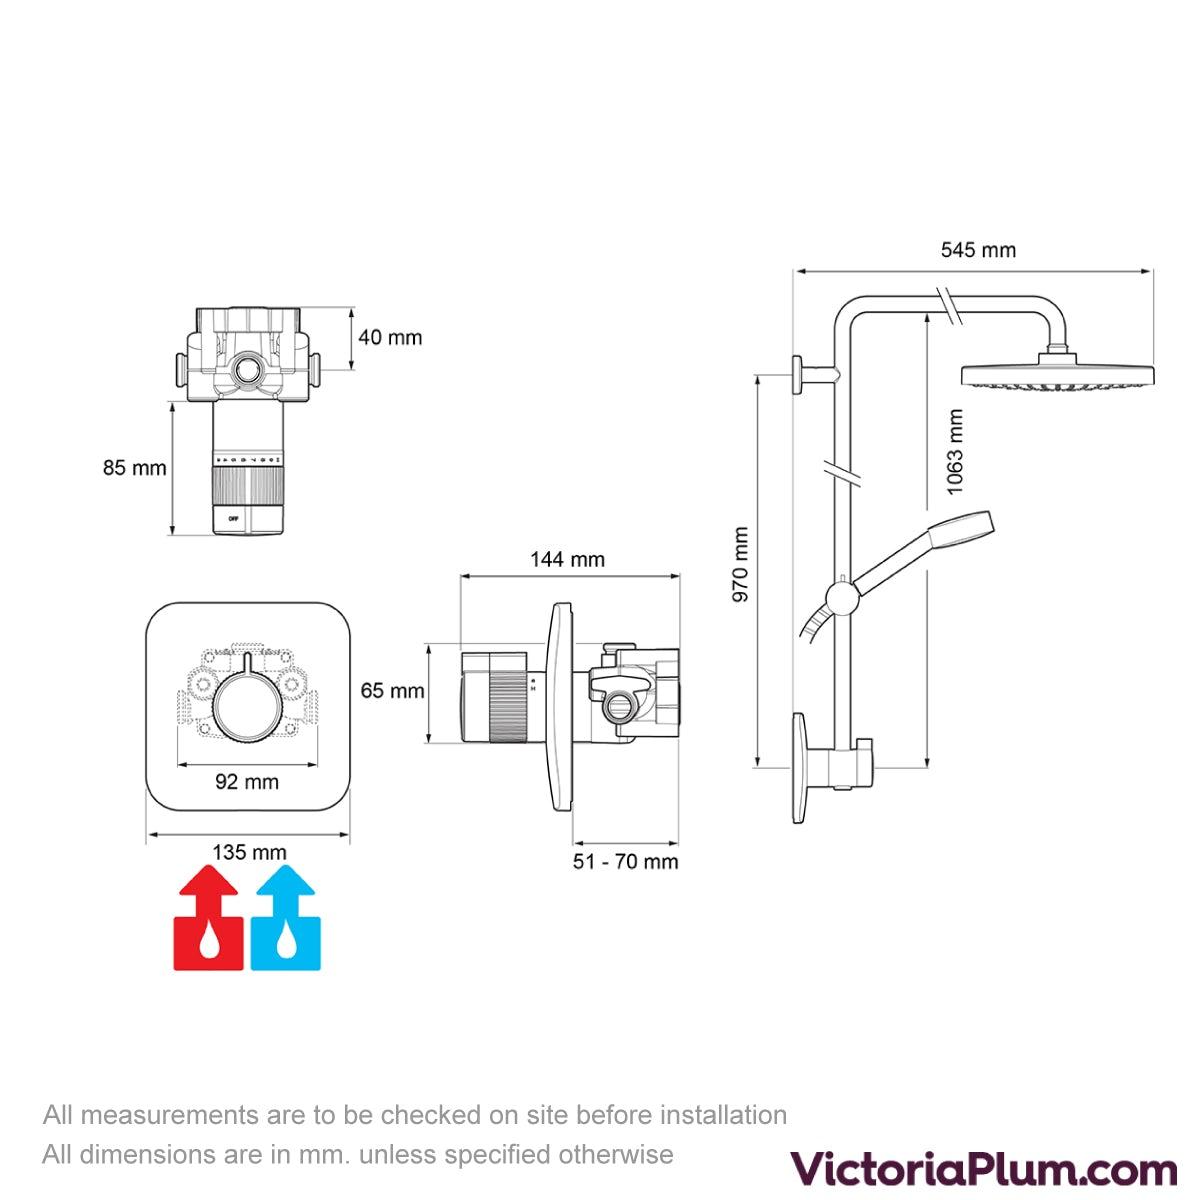 Dimensions for Mira Agile Sense ERD+ thermostatic mixer shower